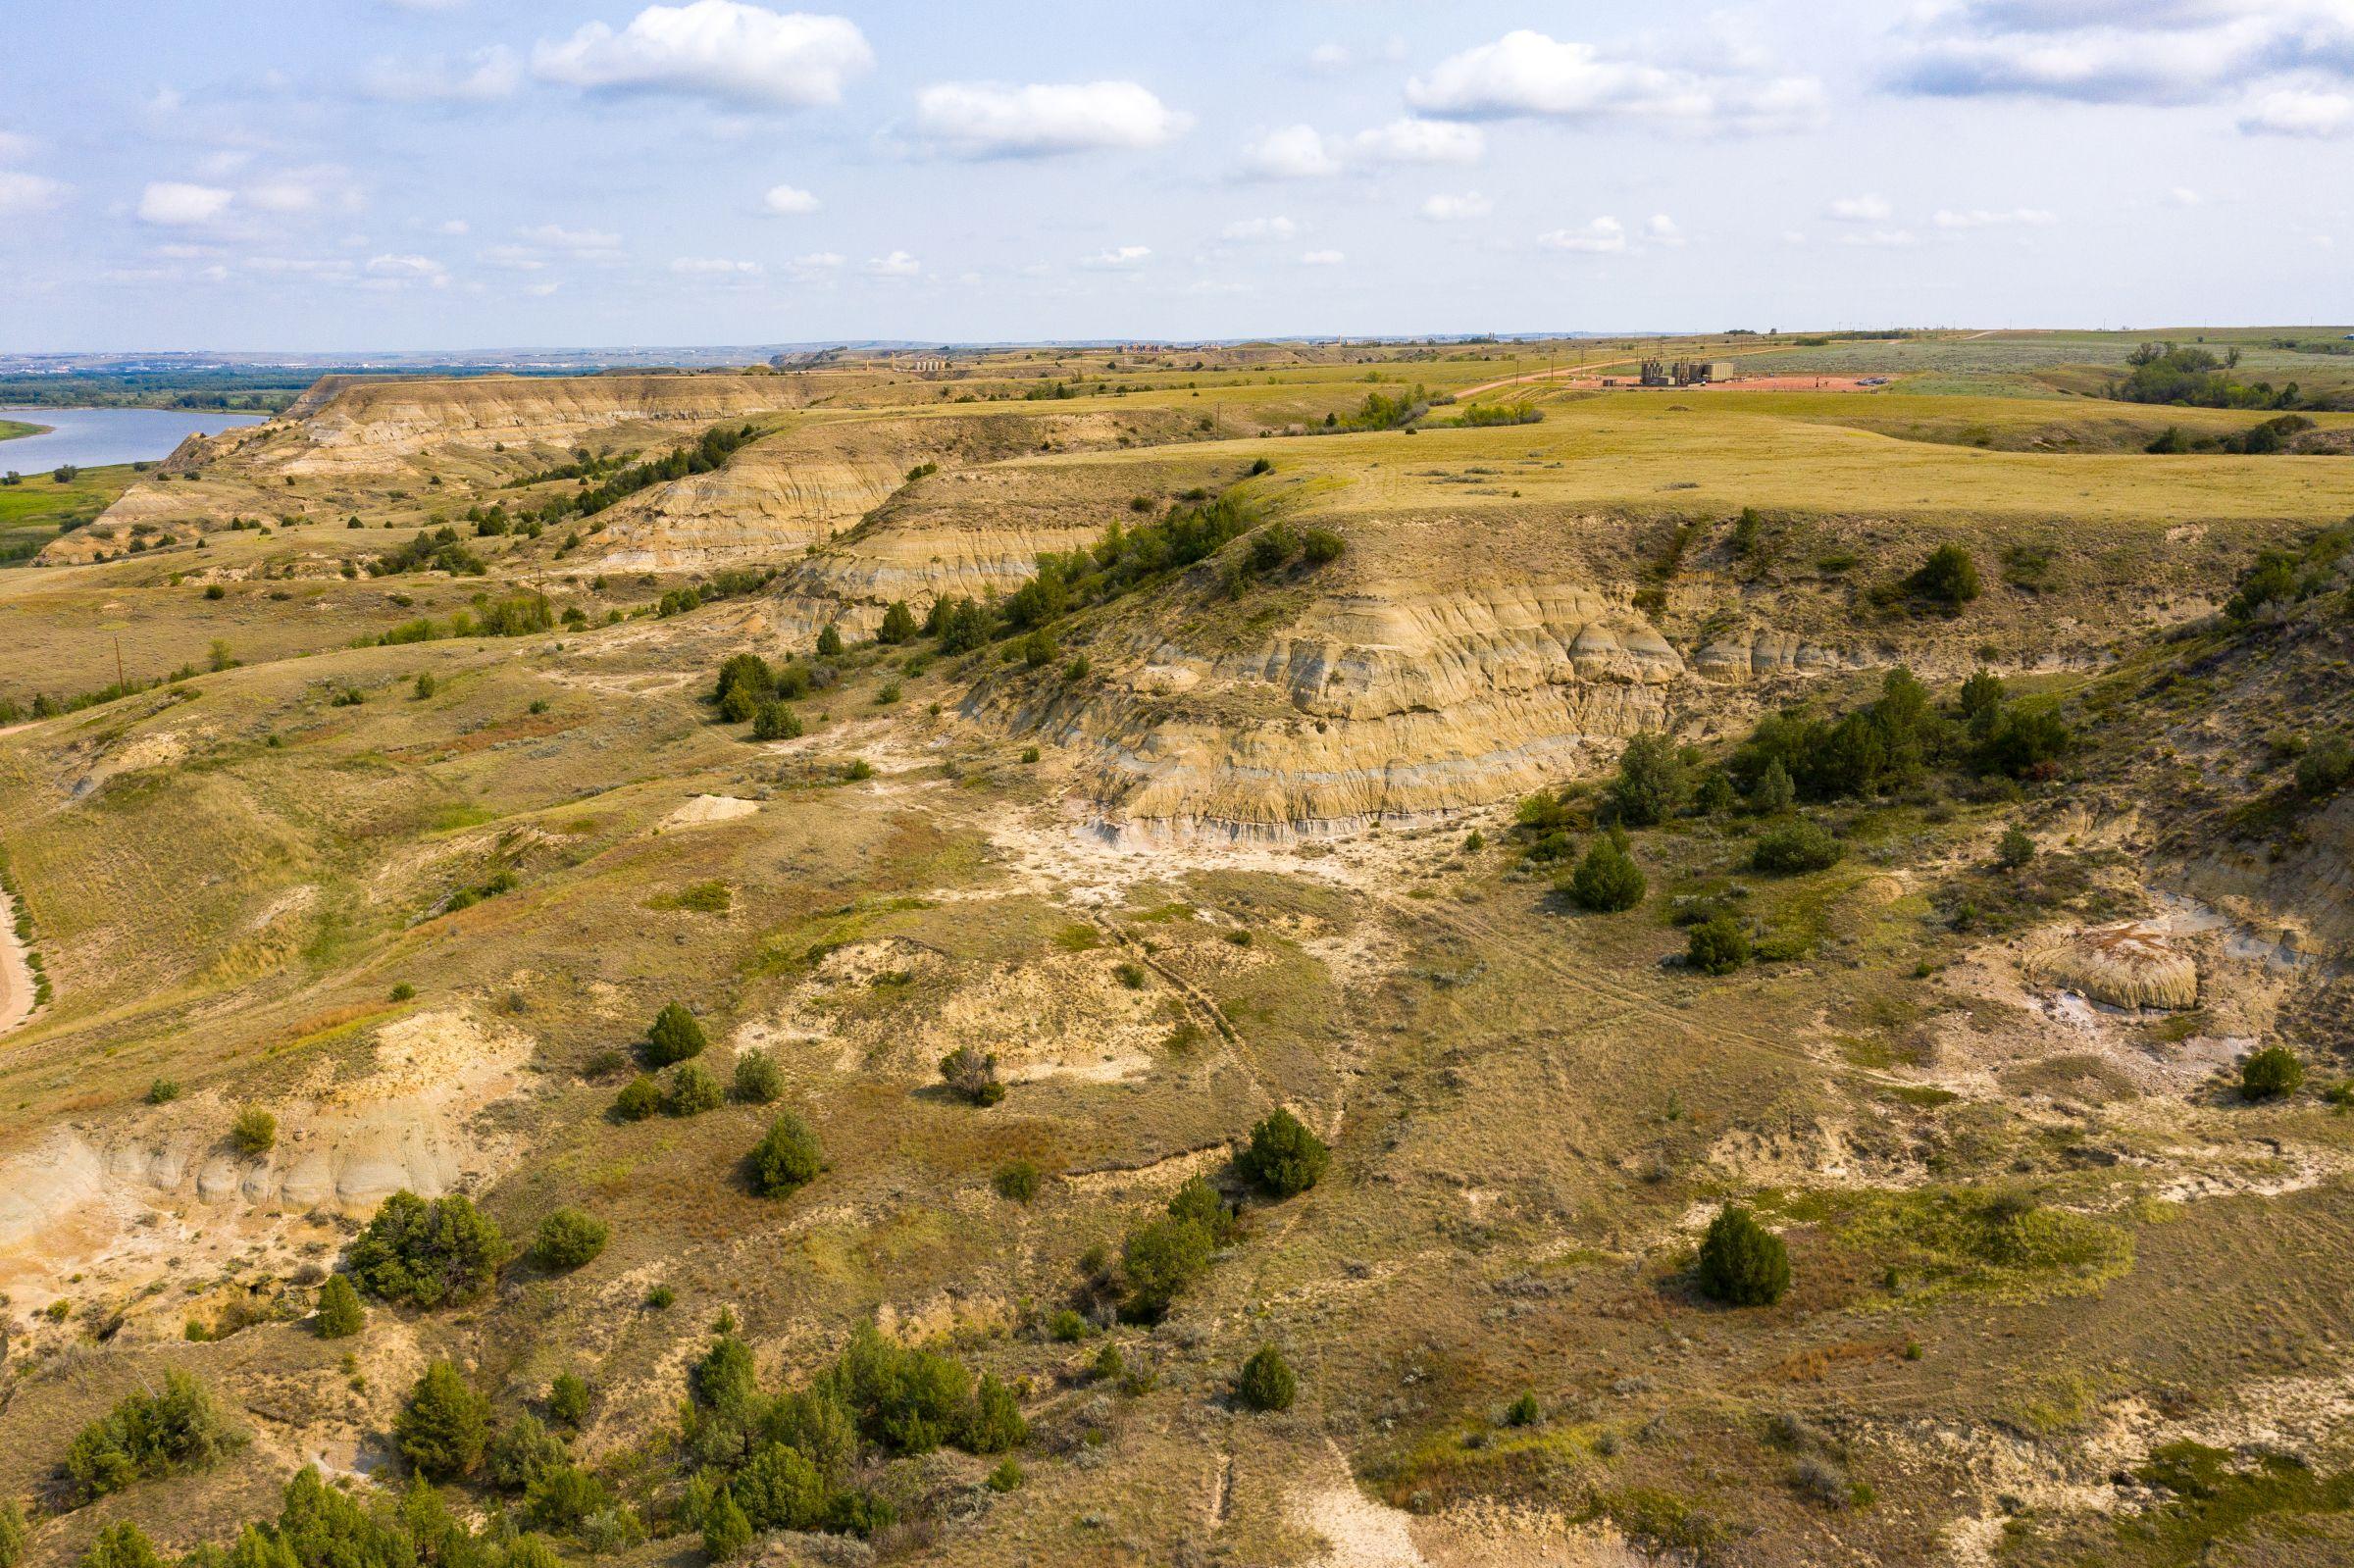 auctions-land-mckenzie-county-north-dakota-270-acres-listing-number-15735-2-2021-09-10-135357.jpeg